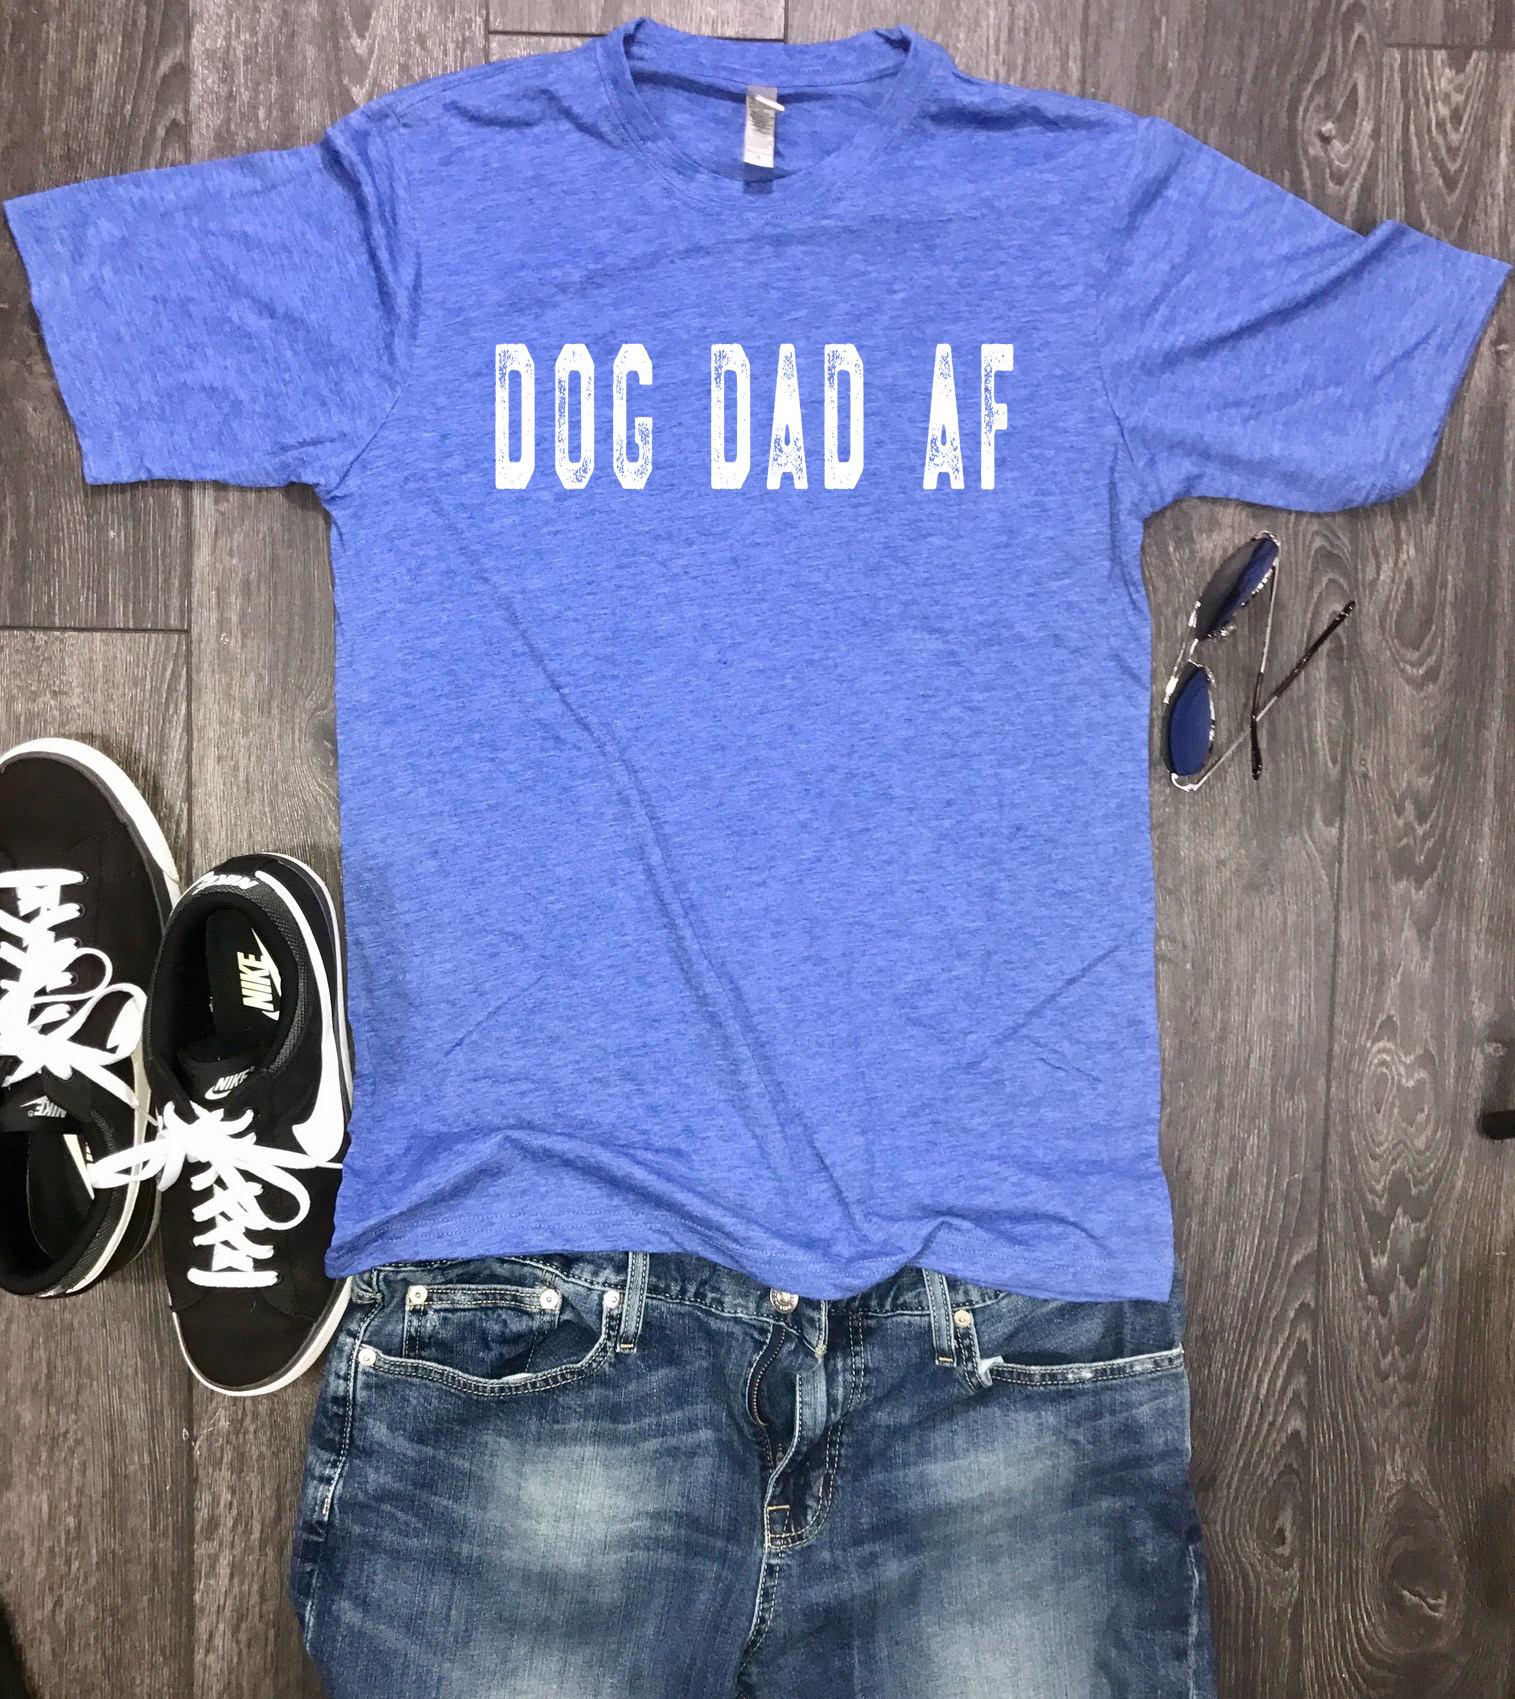 487ebae2 Dog Dad AF mens shirt, dog shirt for men, funny mens dog tshirt, dog daddy,  fur dad, dogs best friend, dog park, dog beach, dog shirt